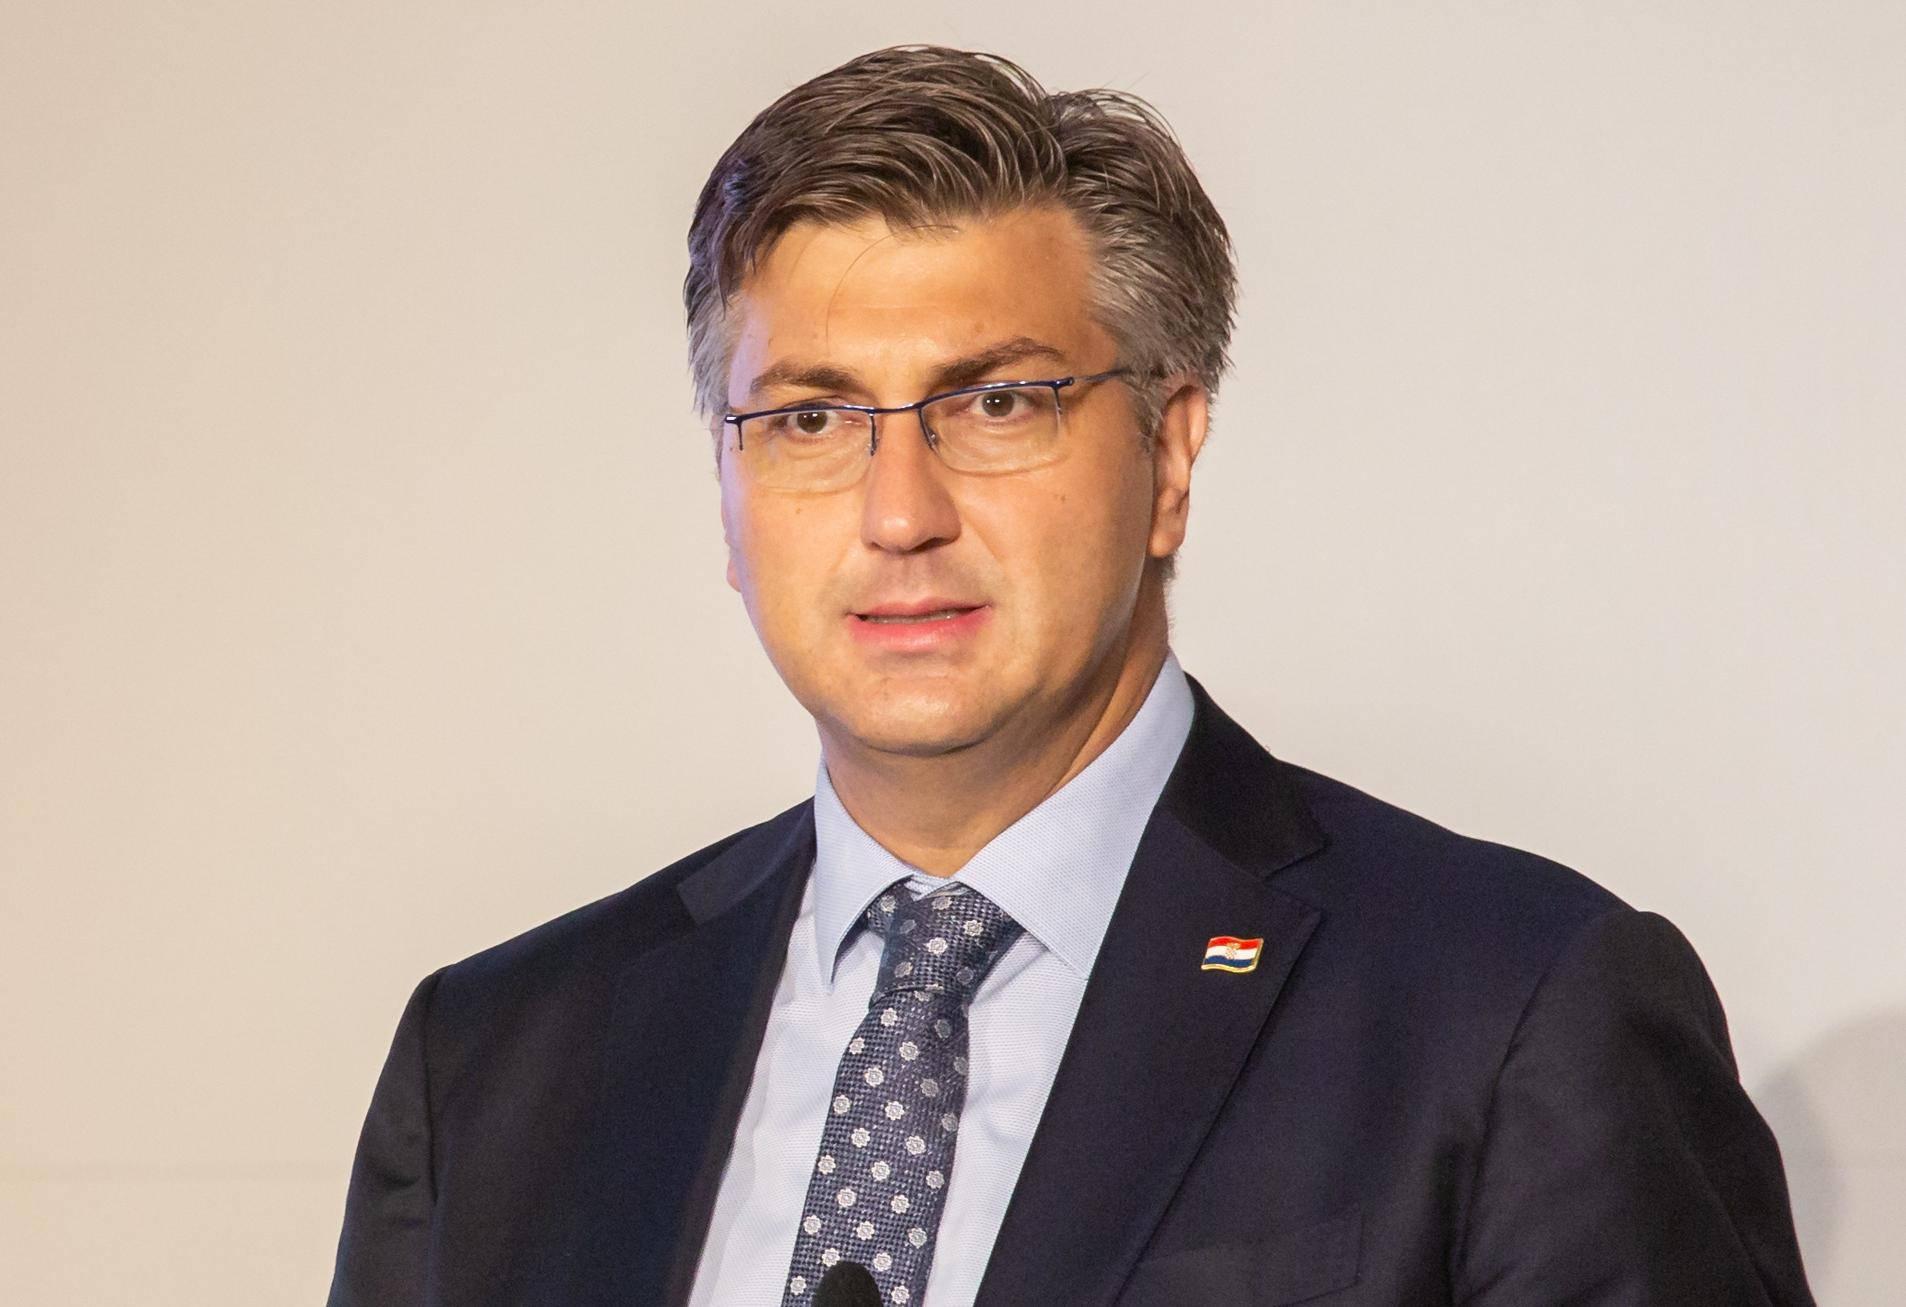 'Najvažniji strateški interes RH odnosi s BiH i položaj  Hrvata'